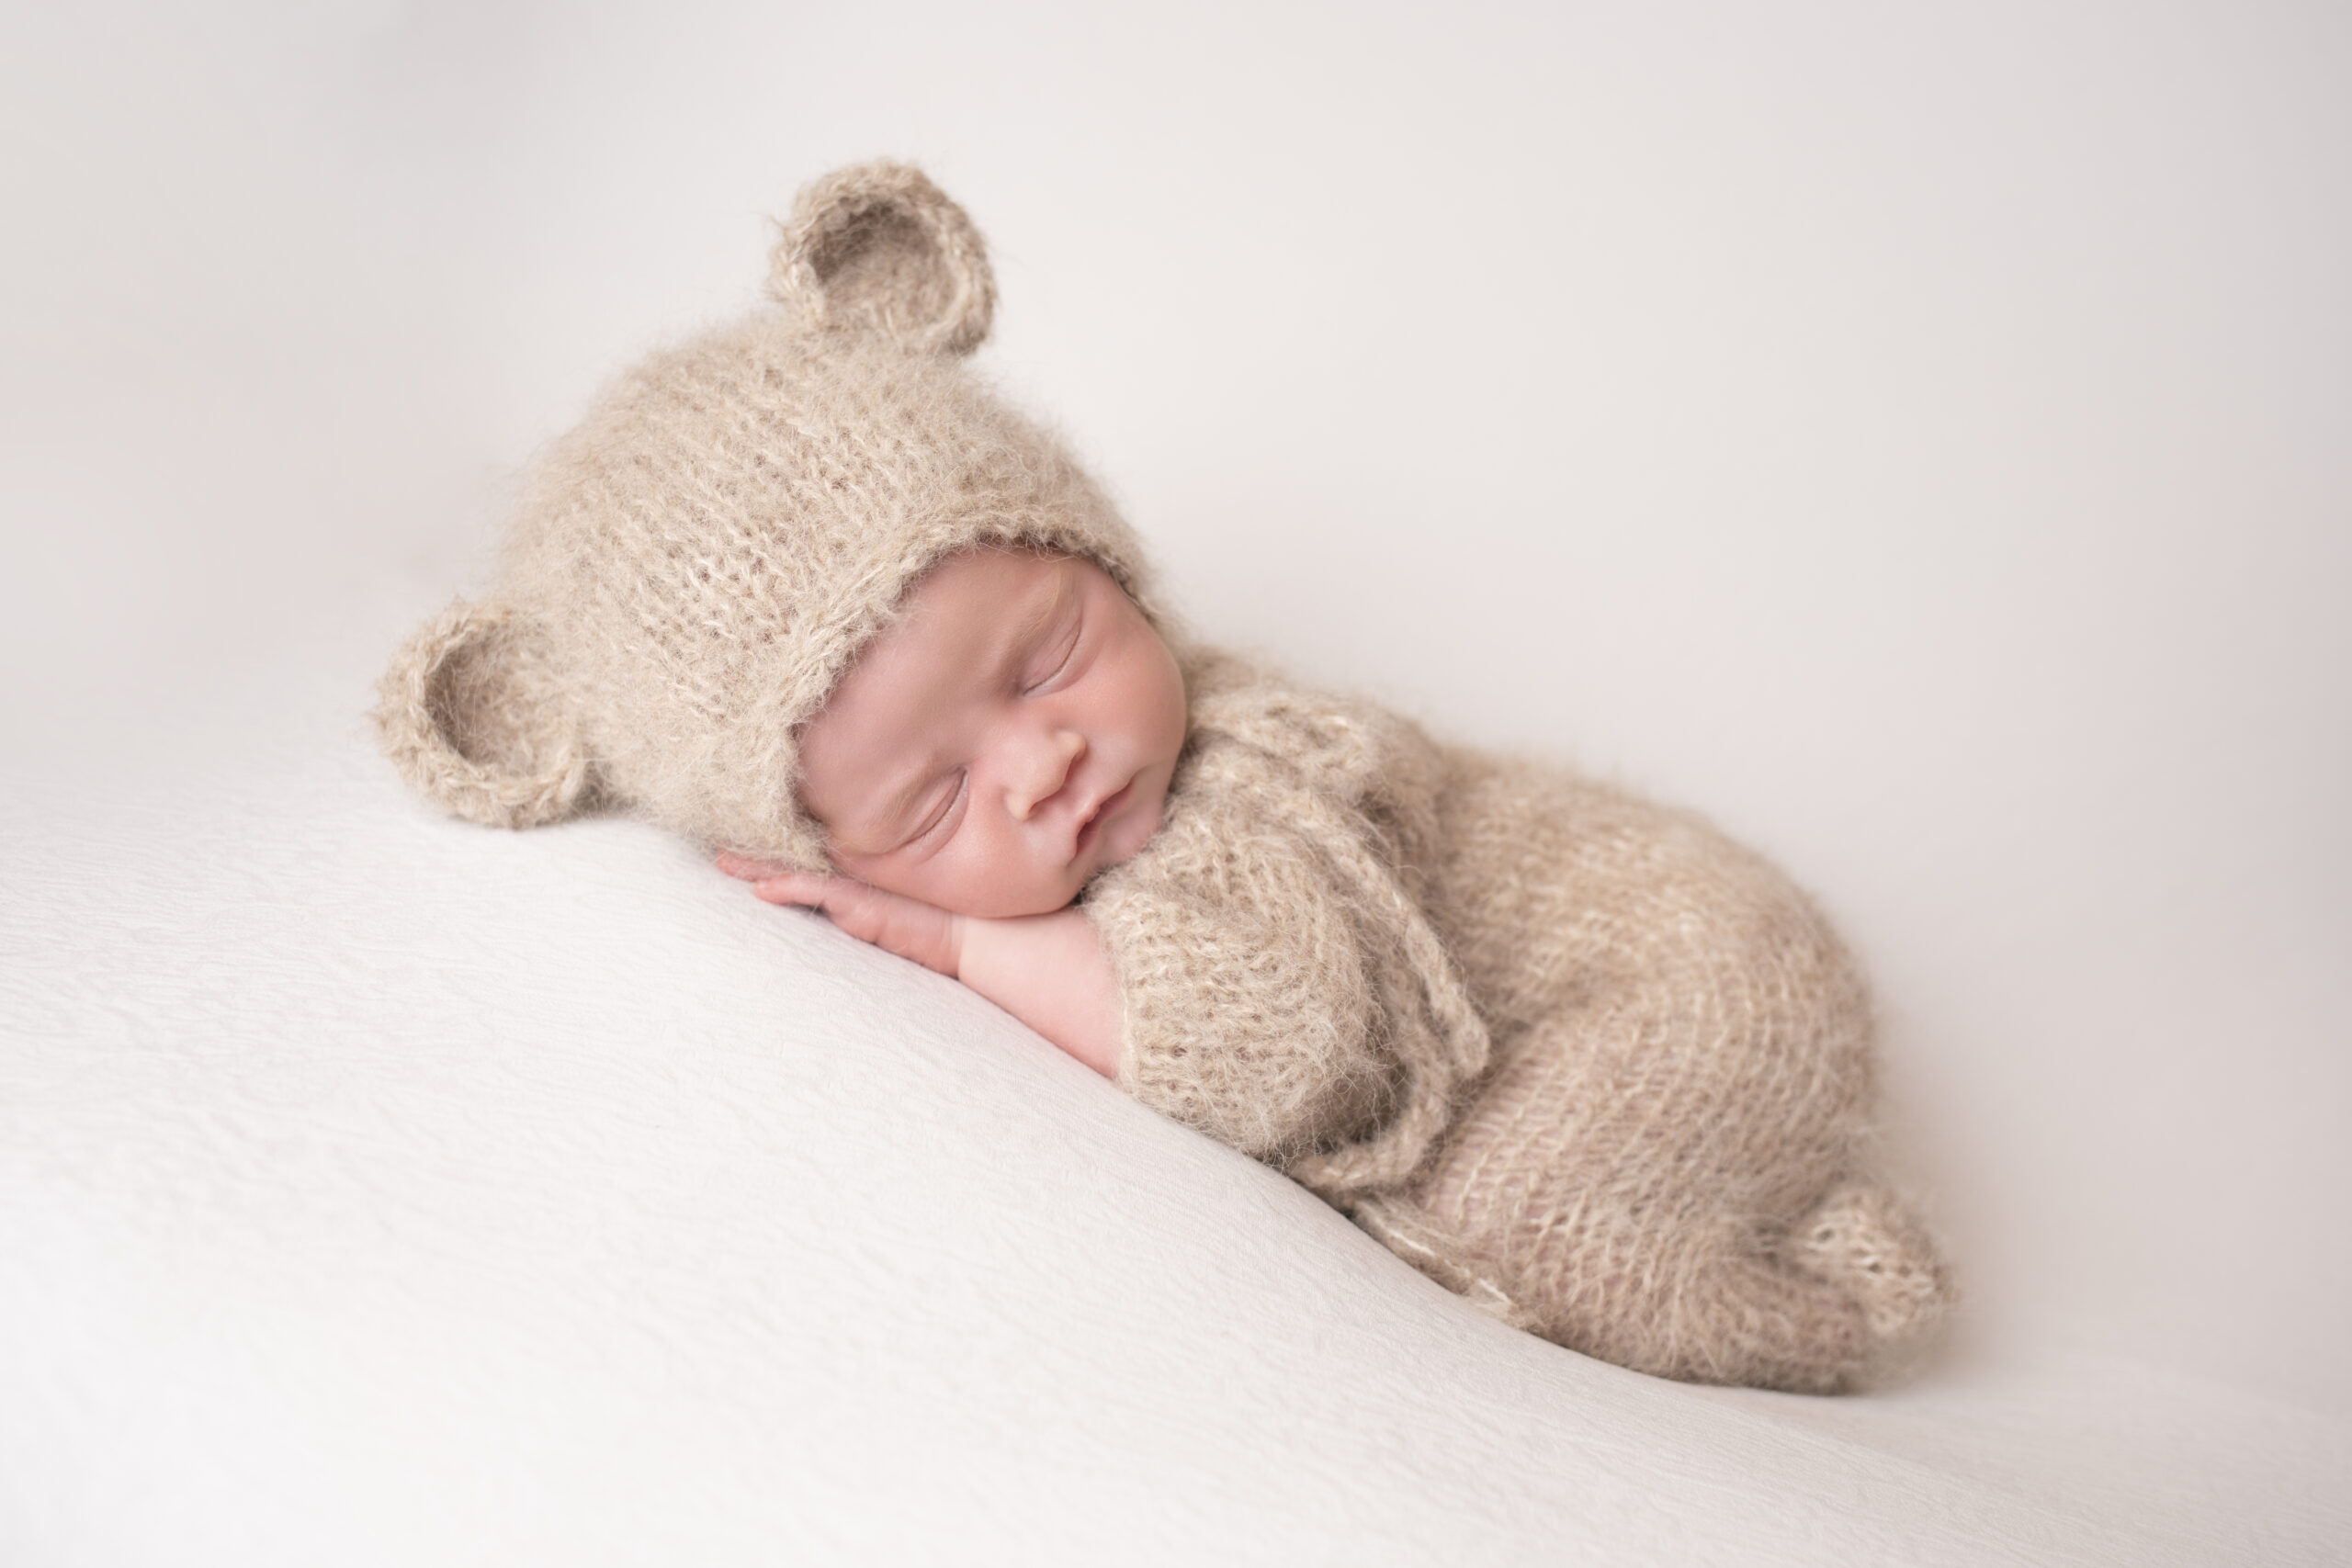 newborn photography studio baby bear Liverpool